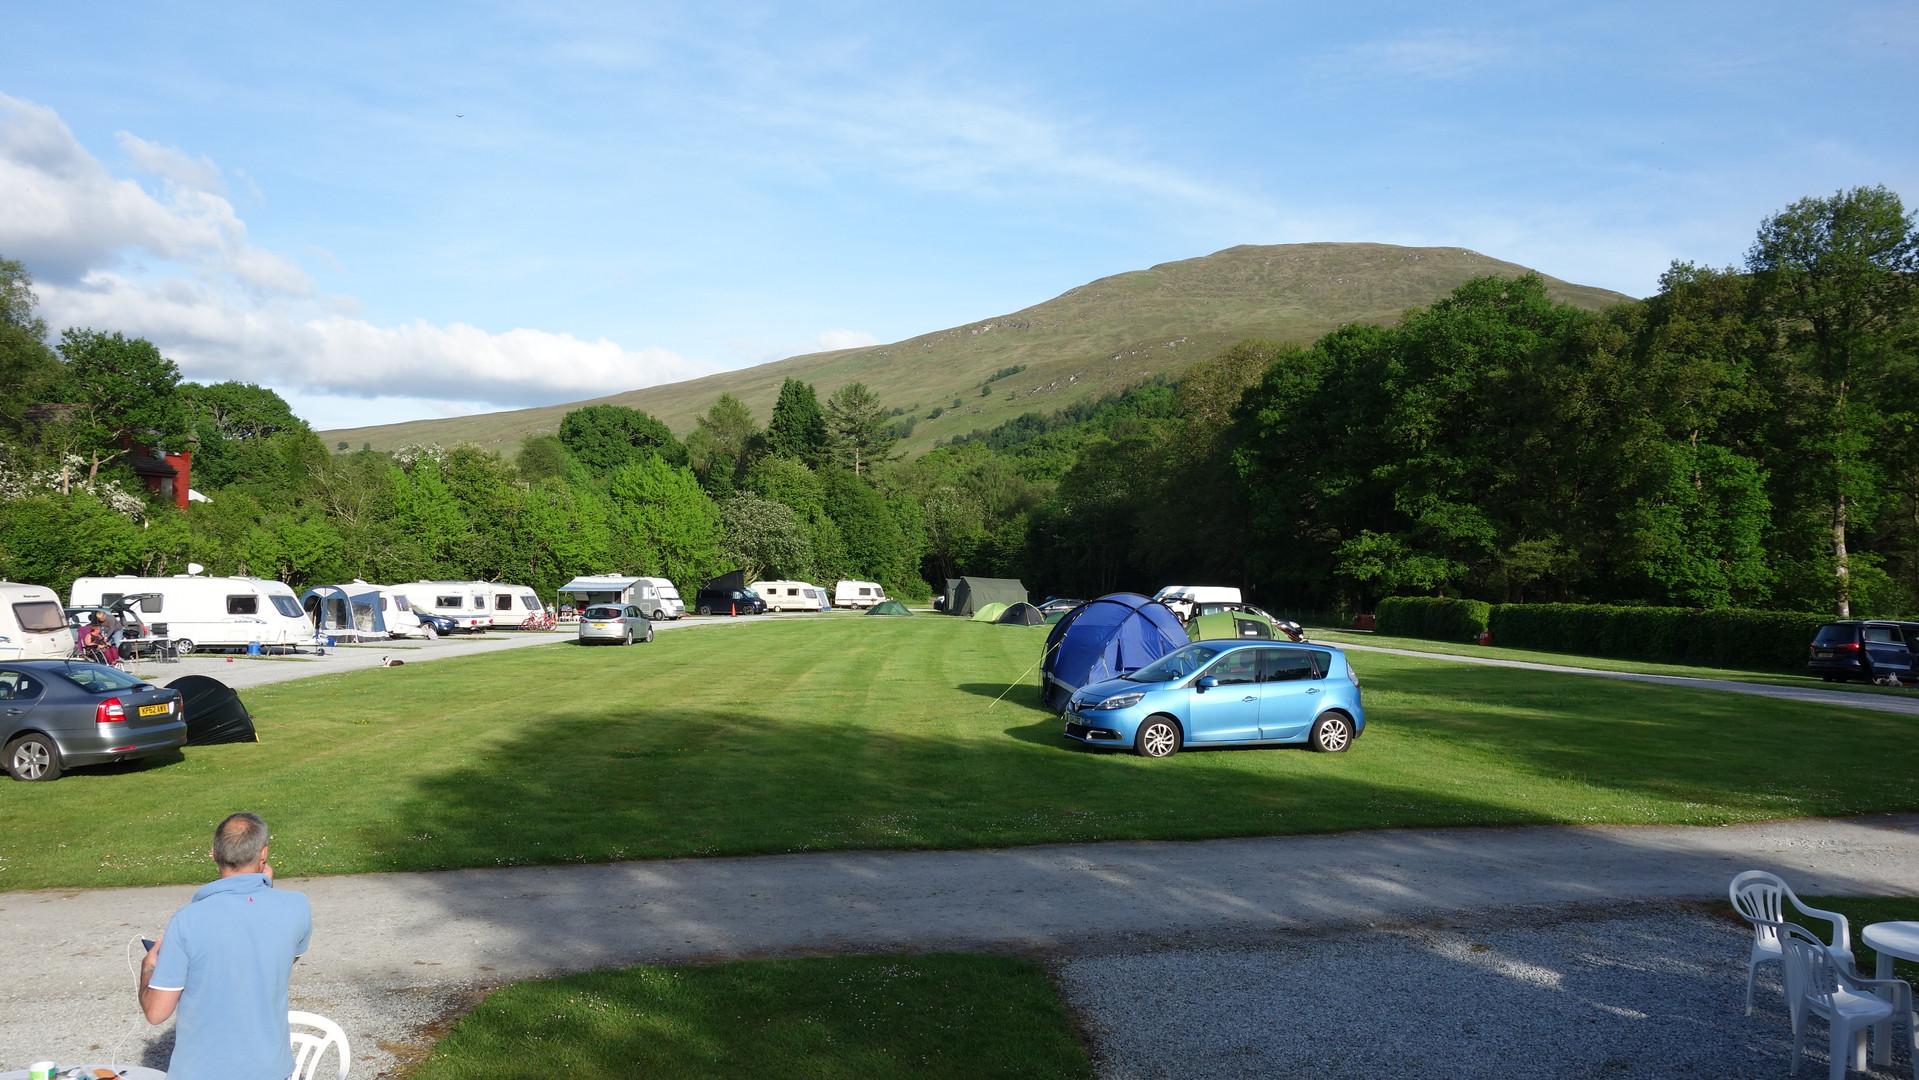 Camping Site Scotland